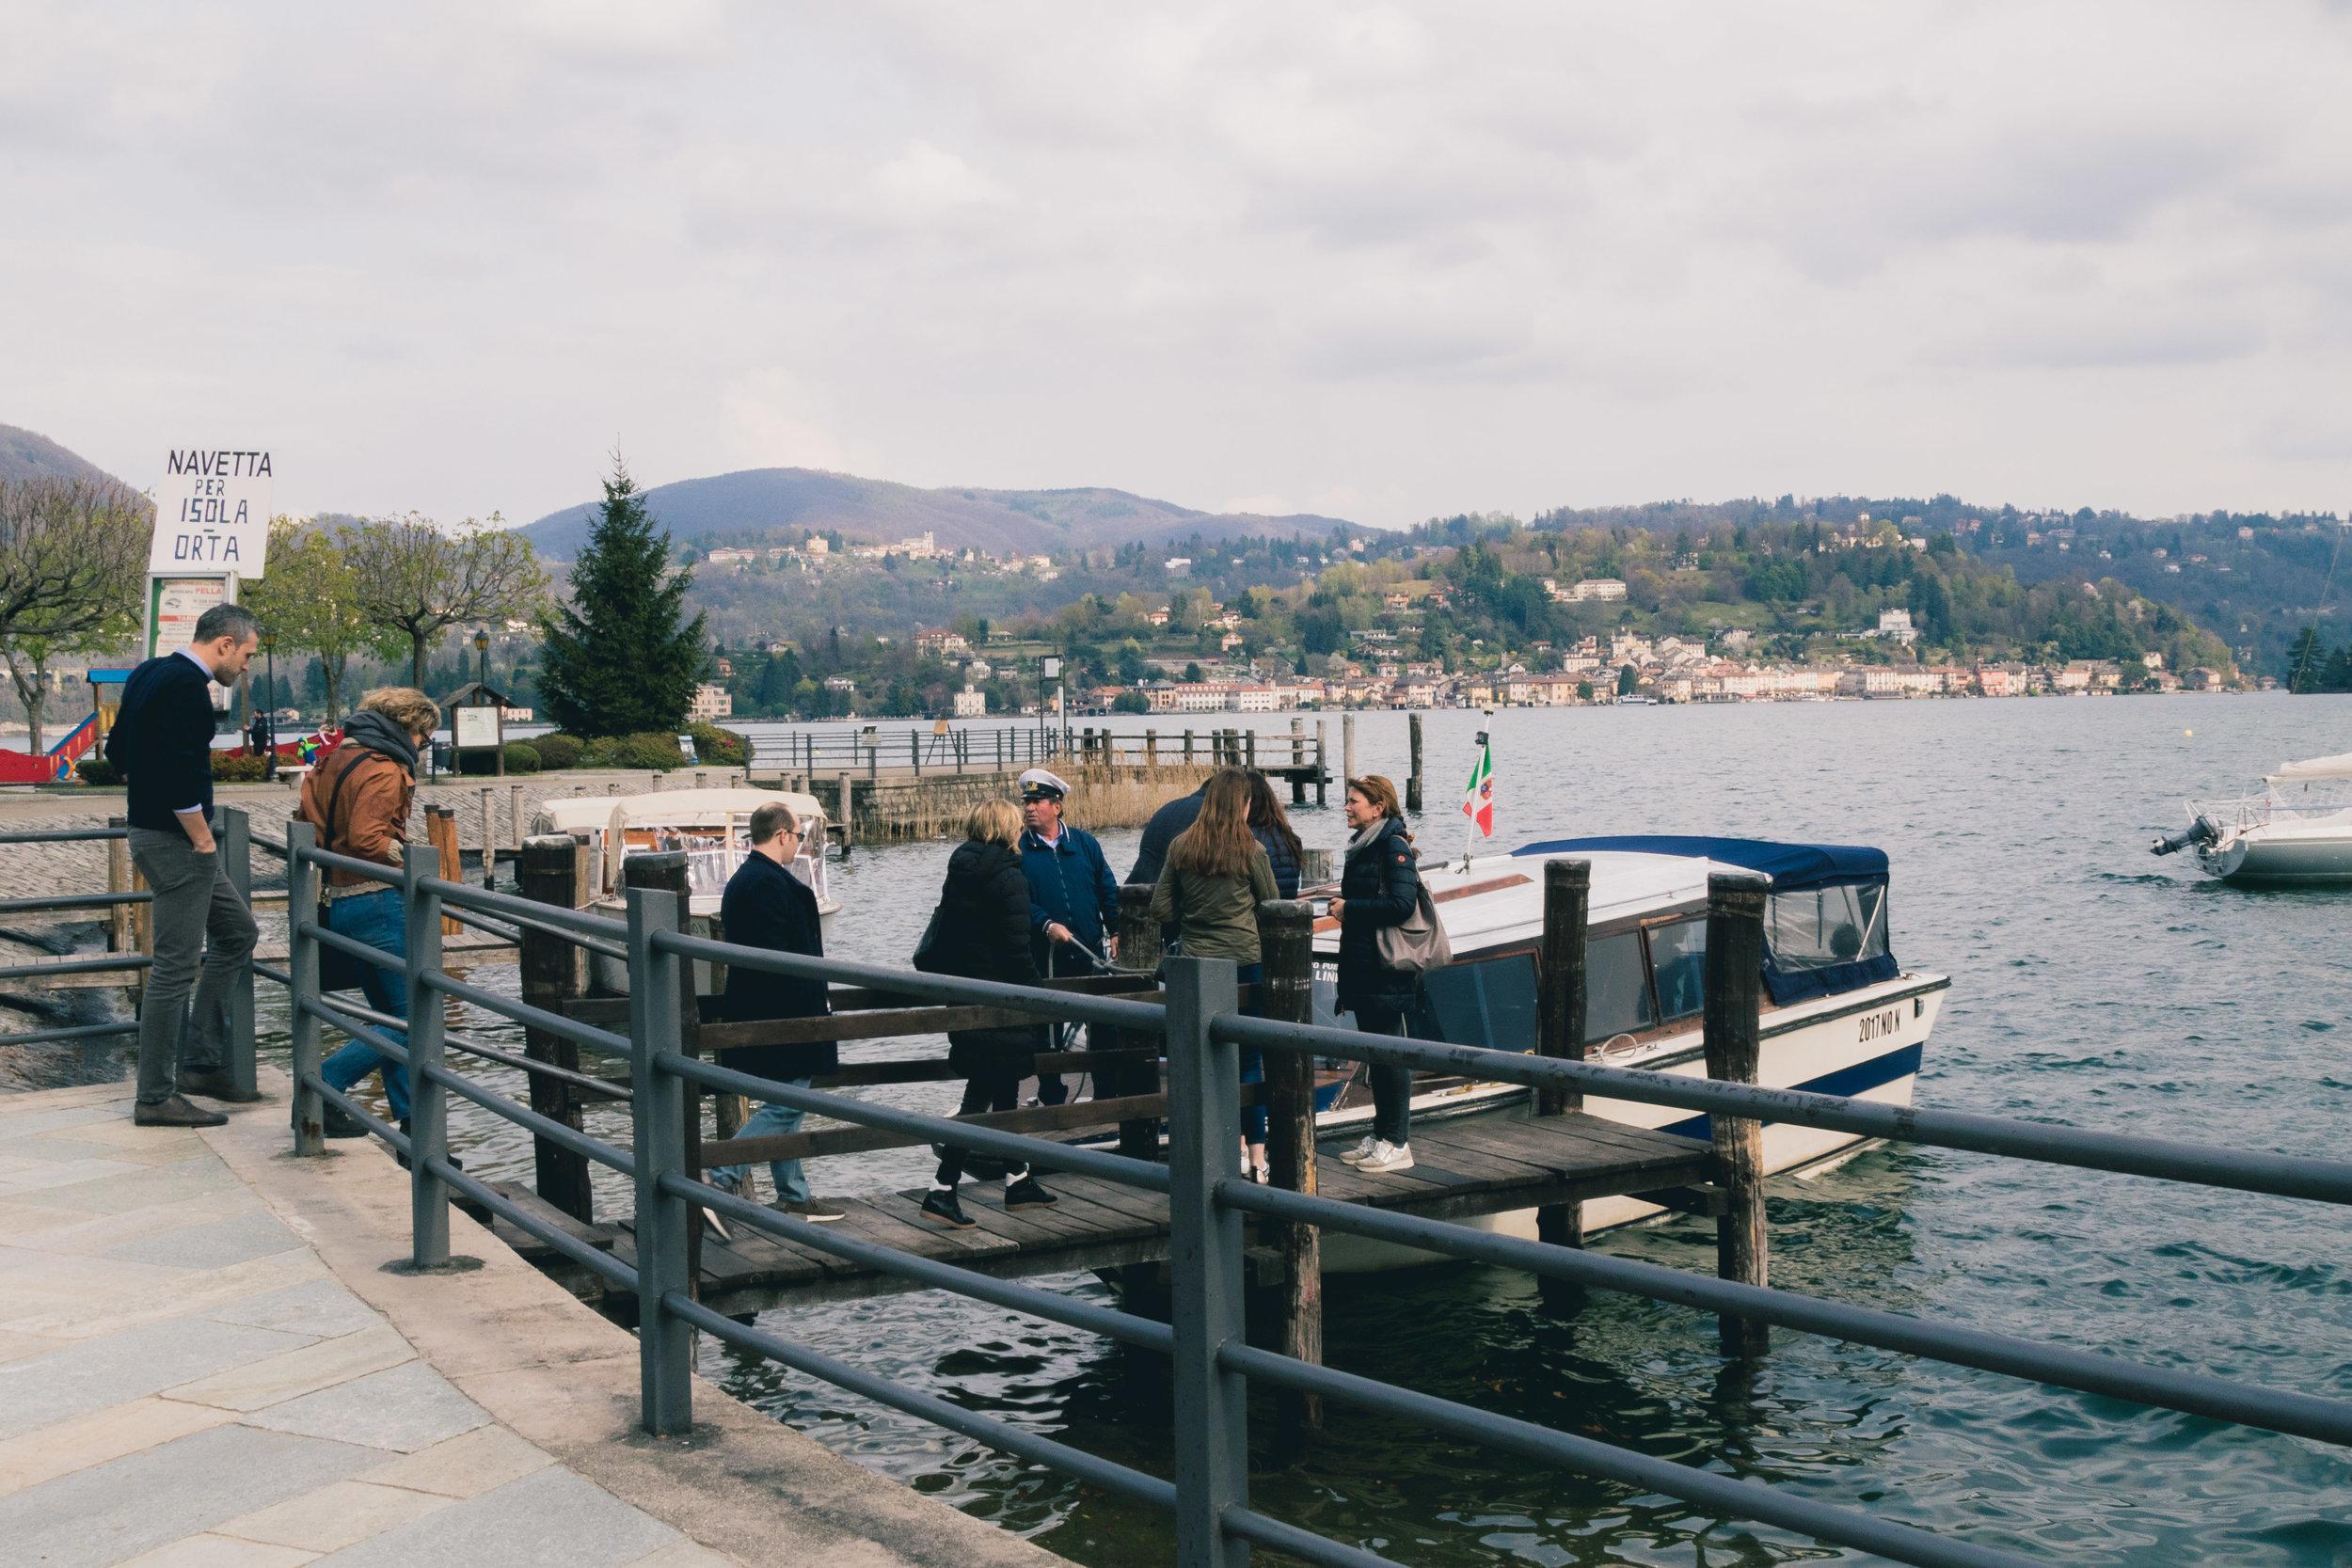 Lake_Orta_Fantini_day1-41.jpg